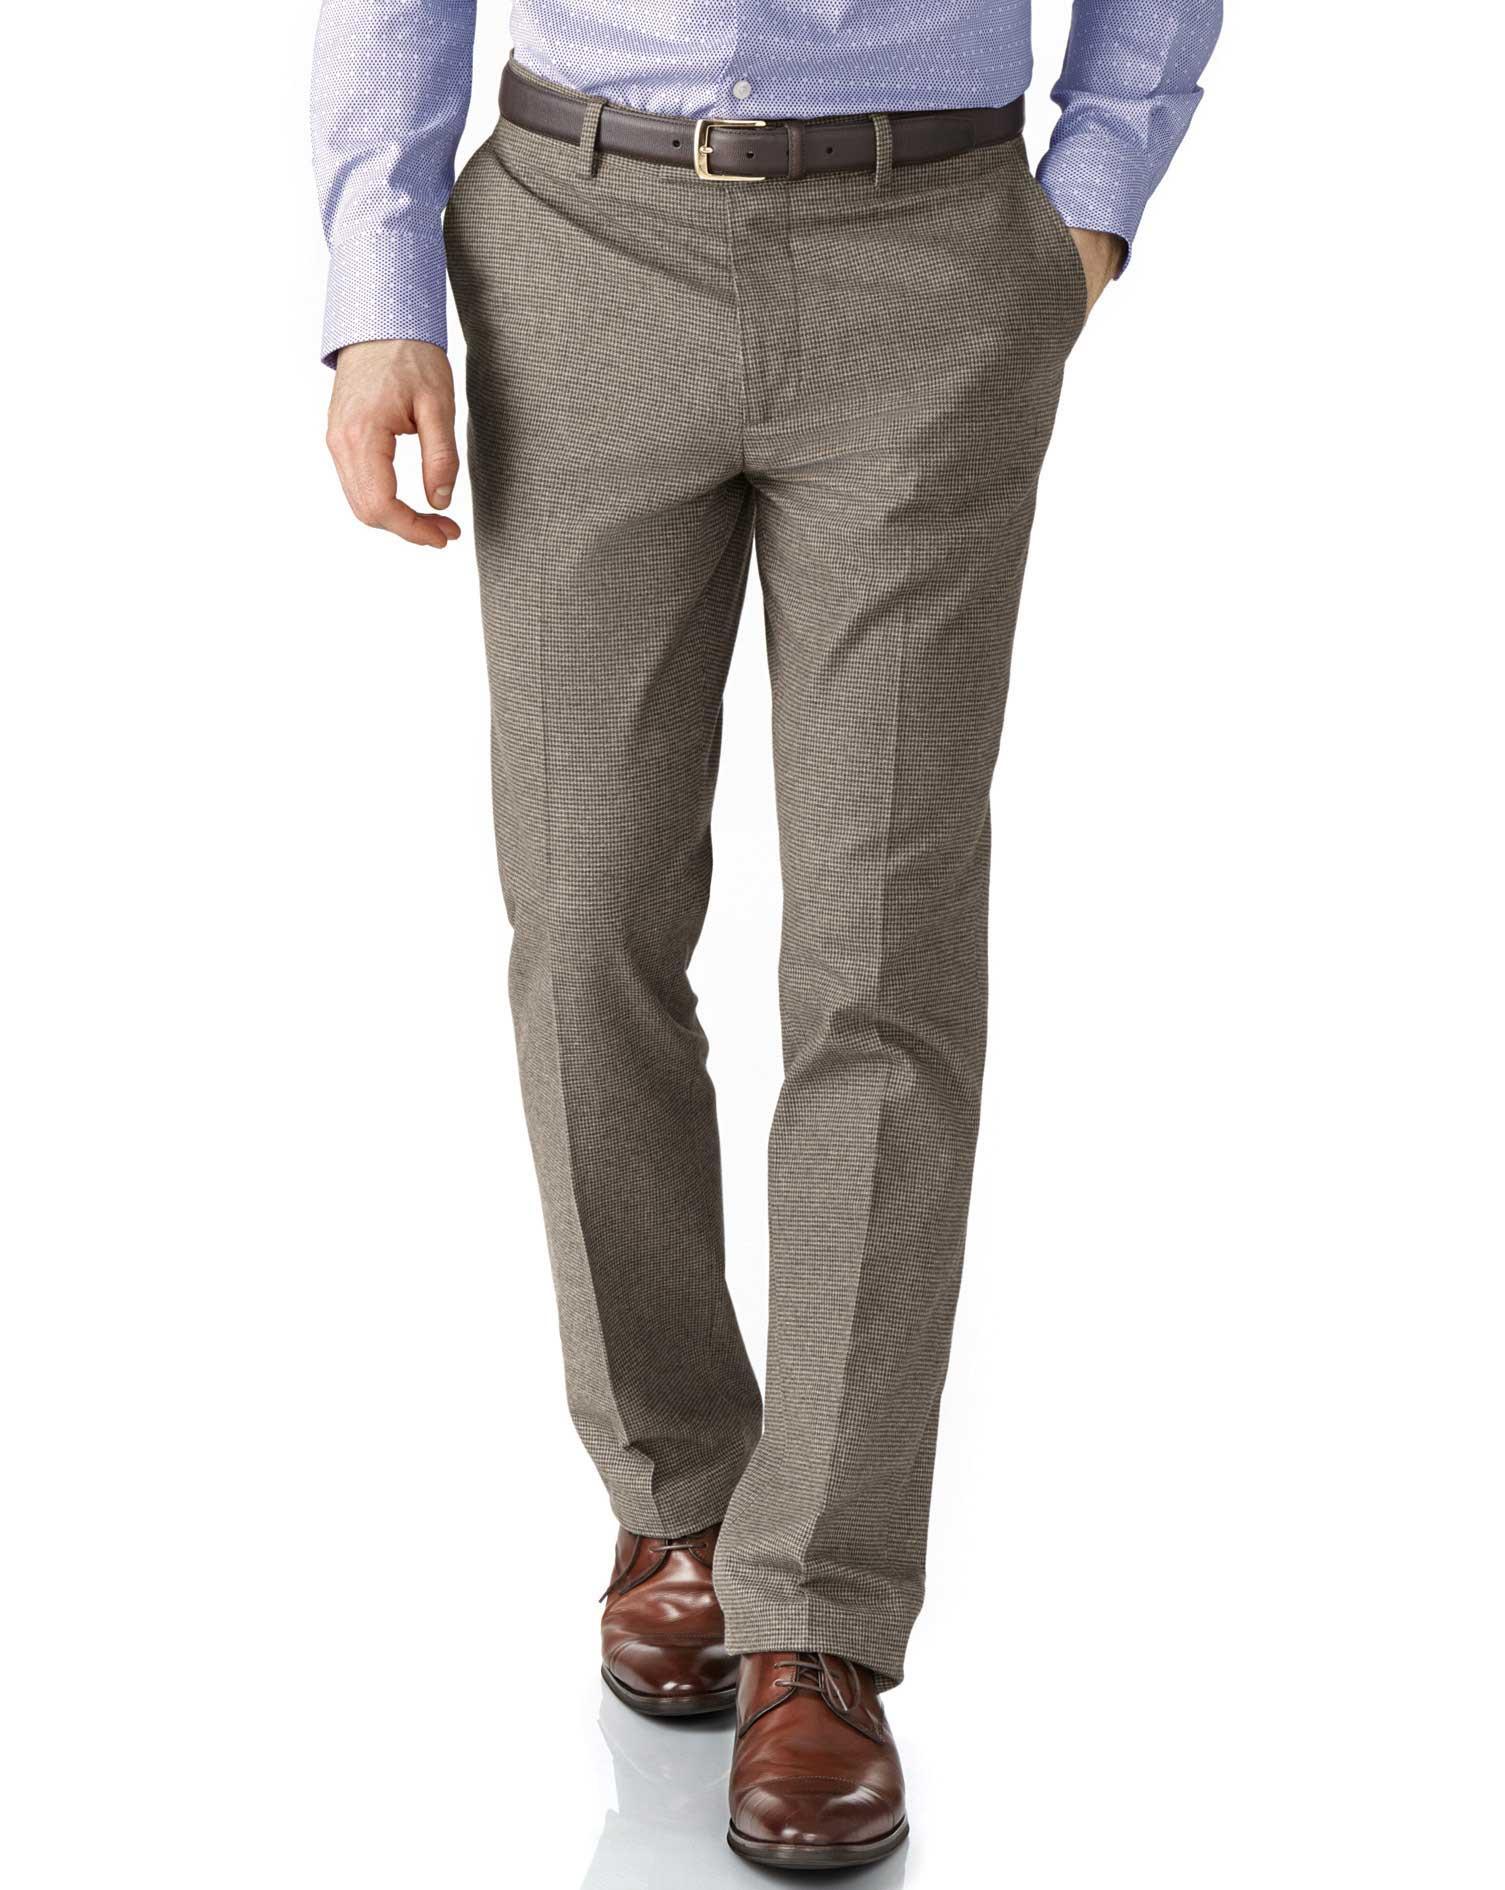 Beige Slim Fit Cotton Flannel Trouser Size W34 L32 by Charles Tyrwhitt